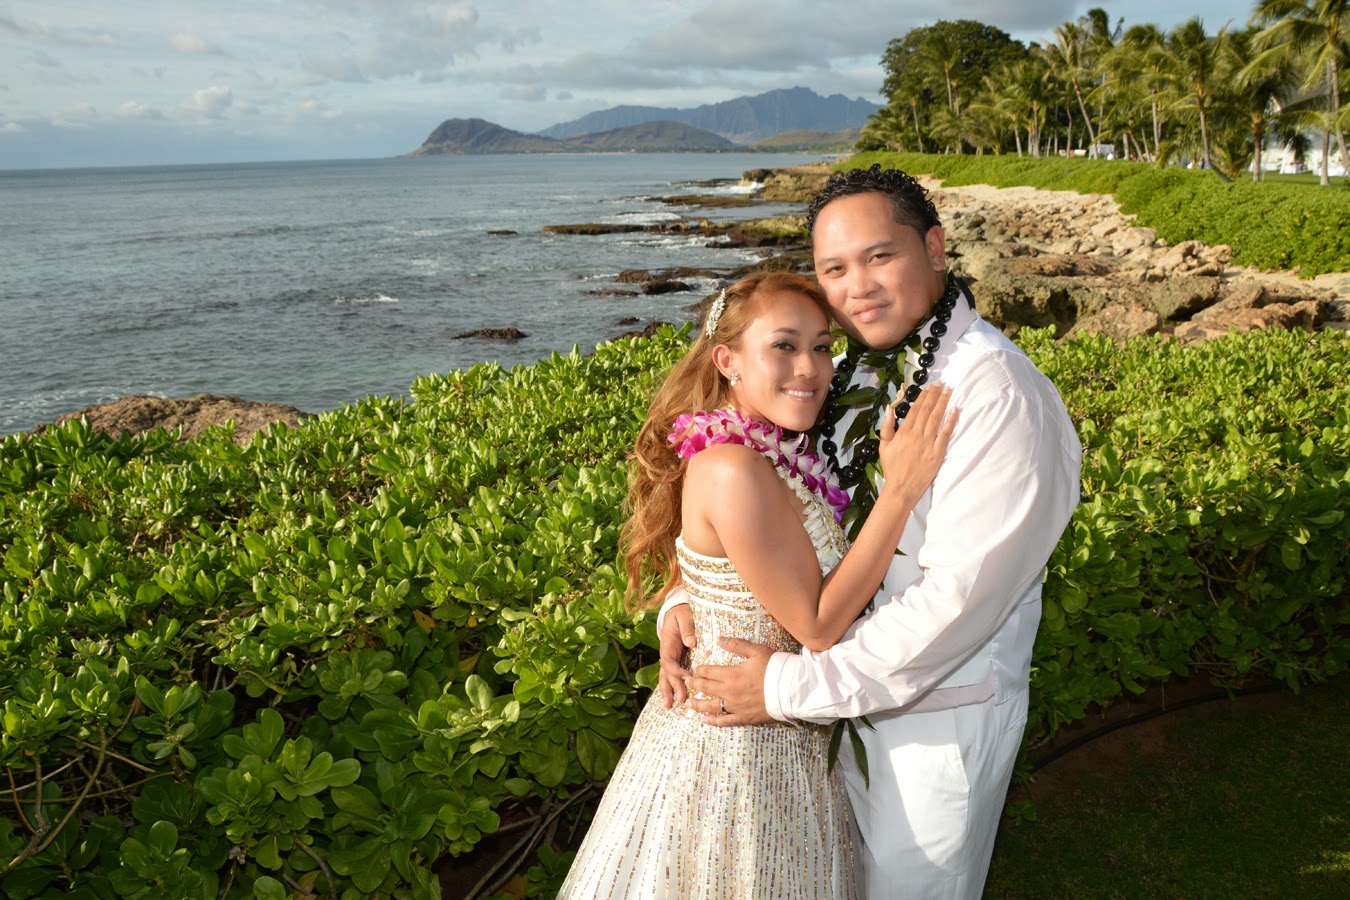 West Oahu Coastline